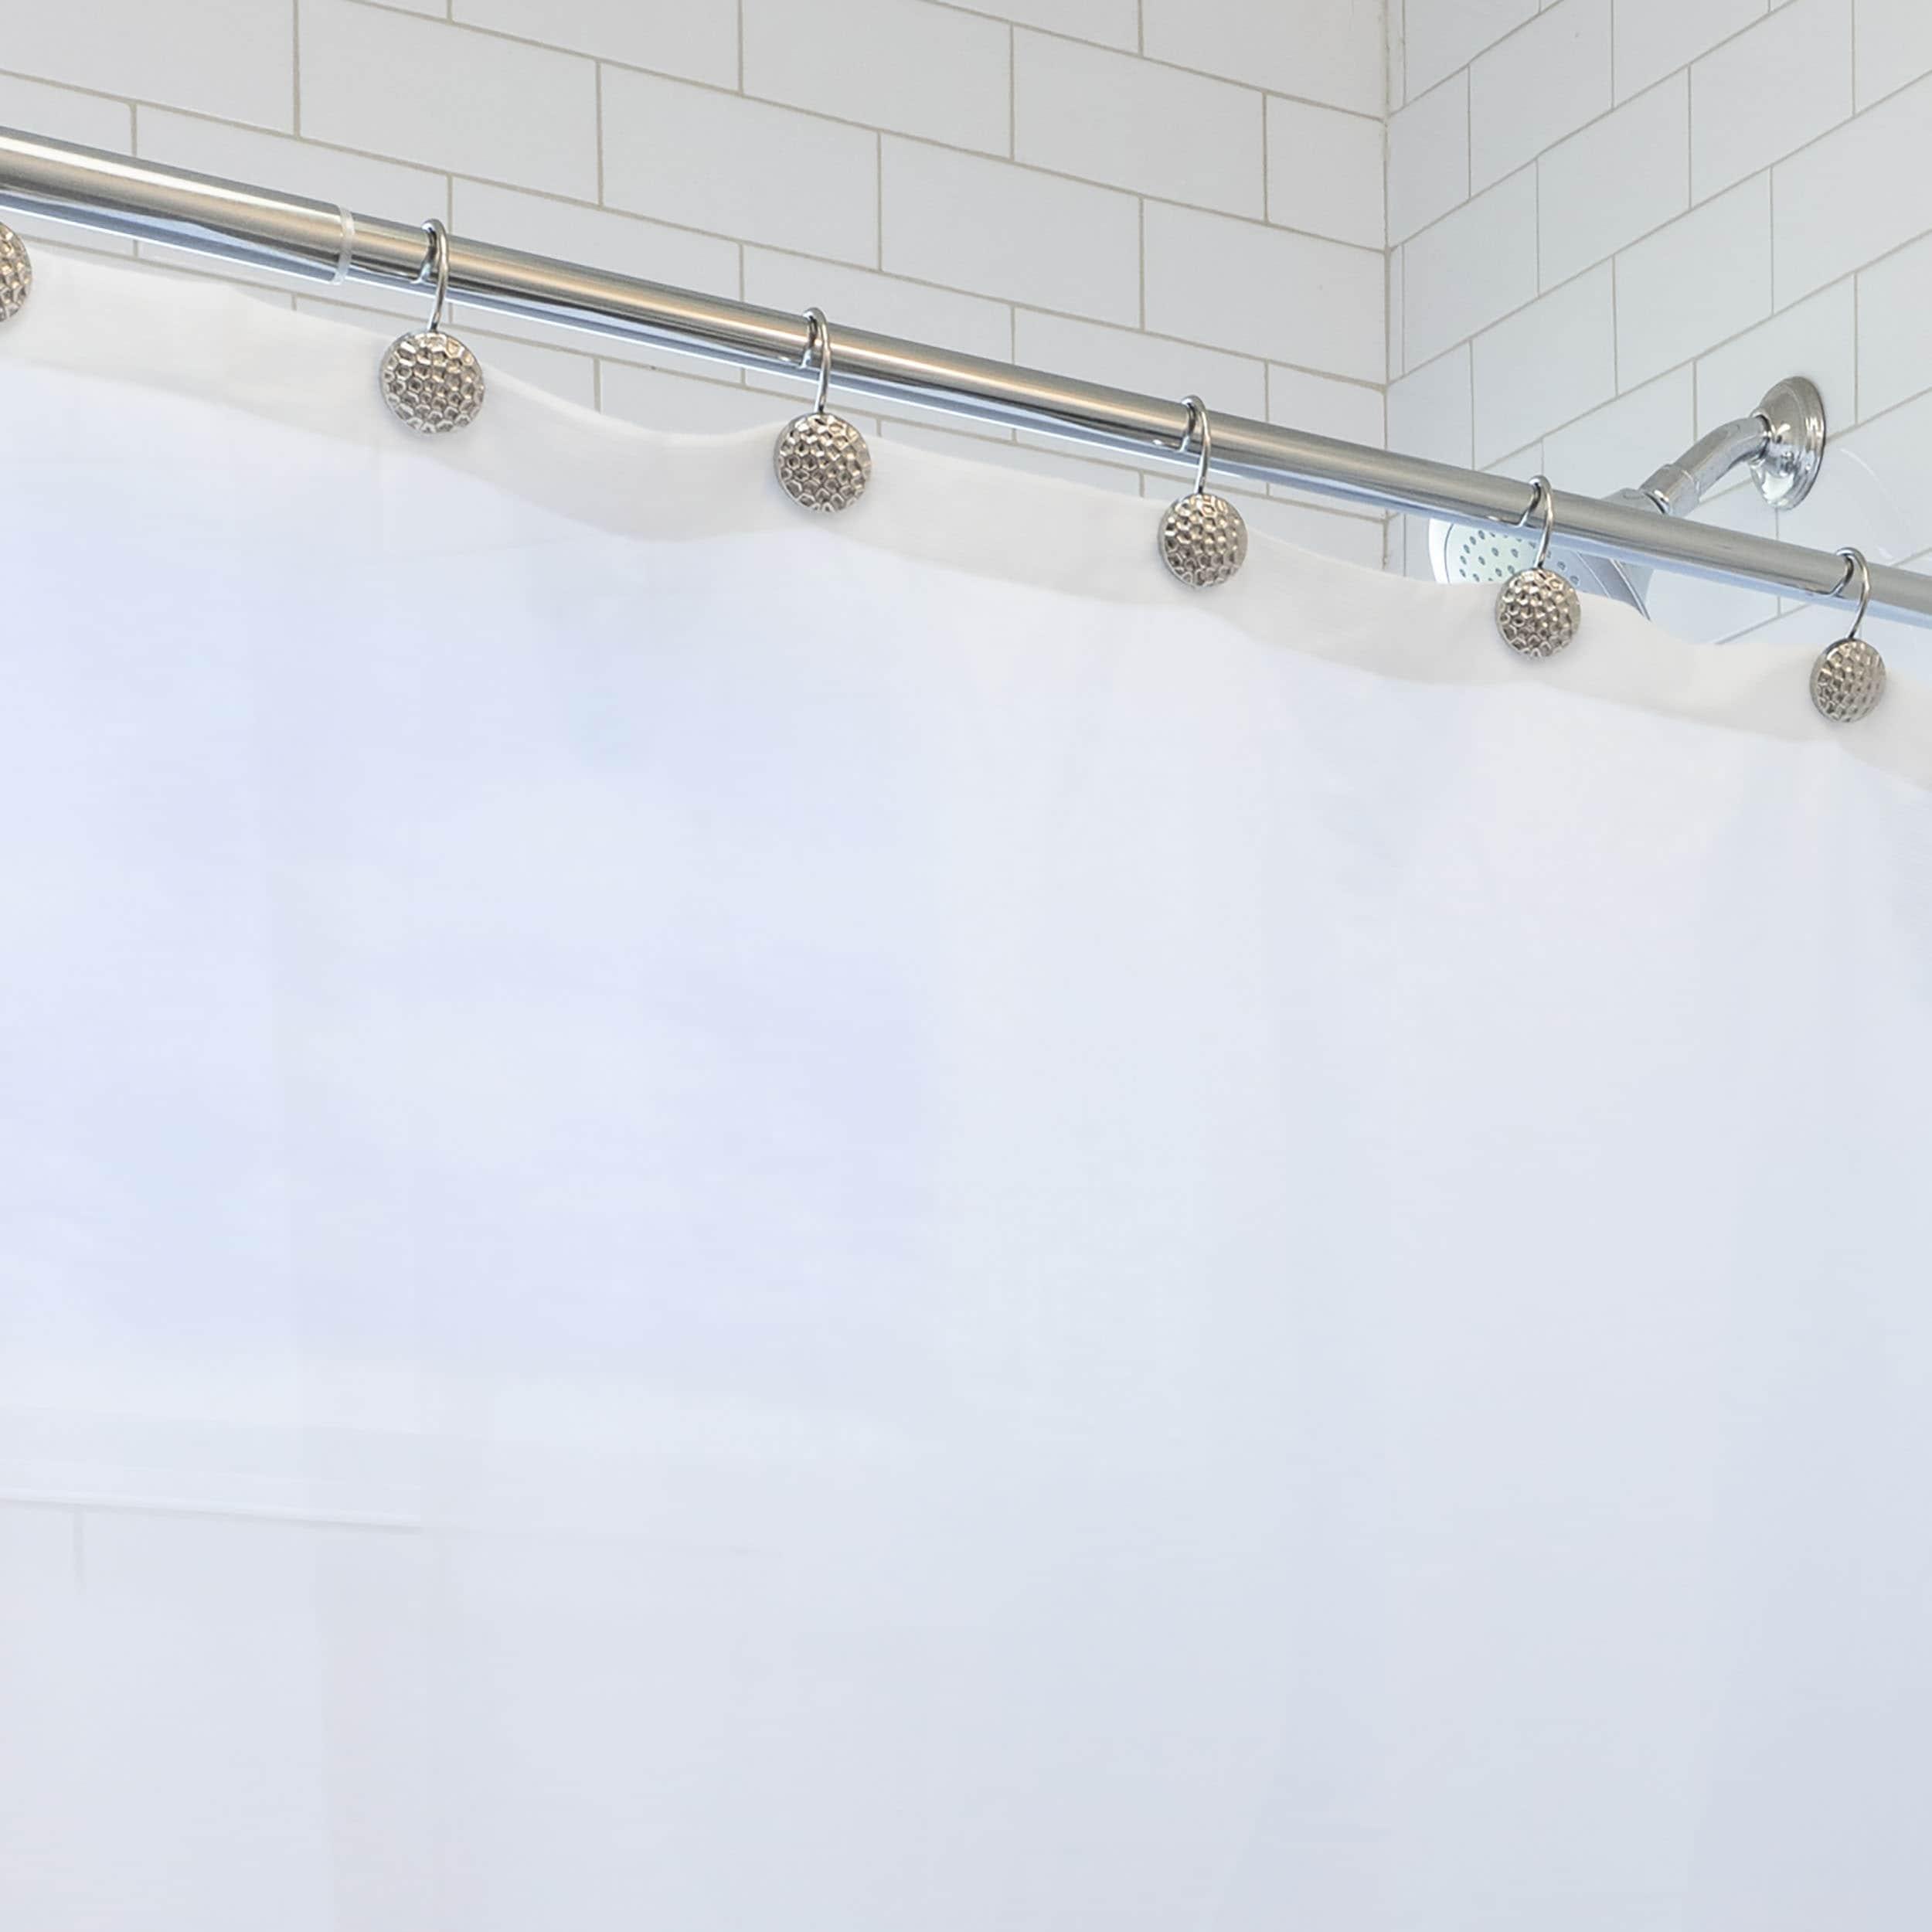 Shop Laura Ashley Peva Shower Curtain Liner Frosty